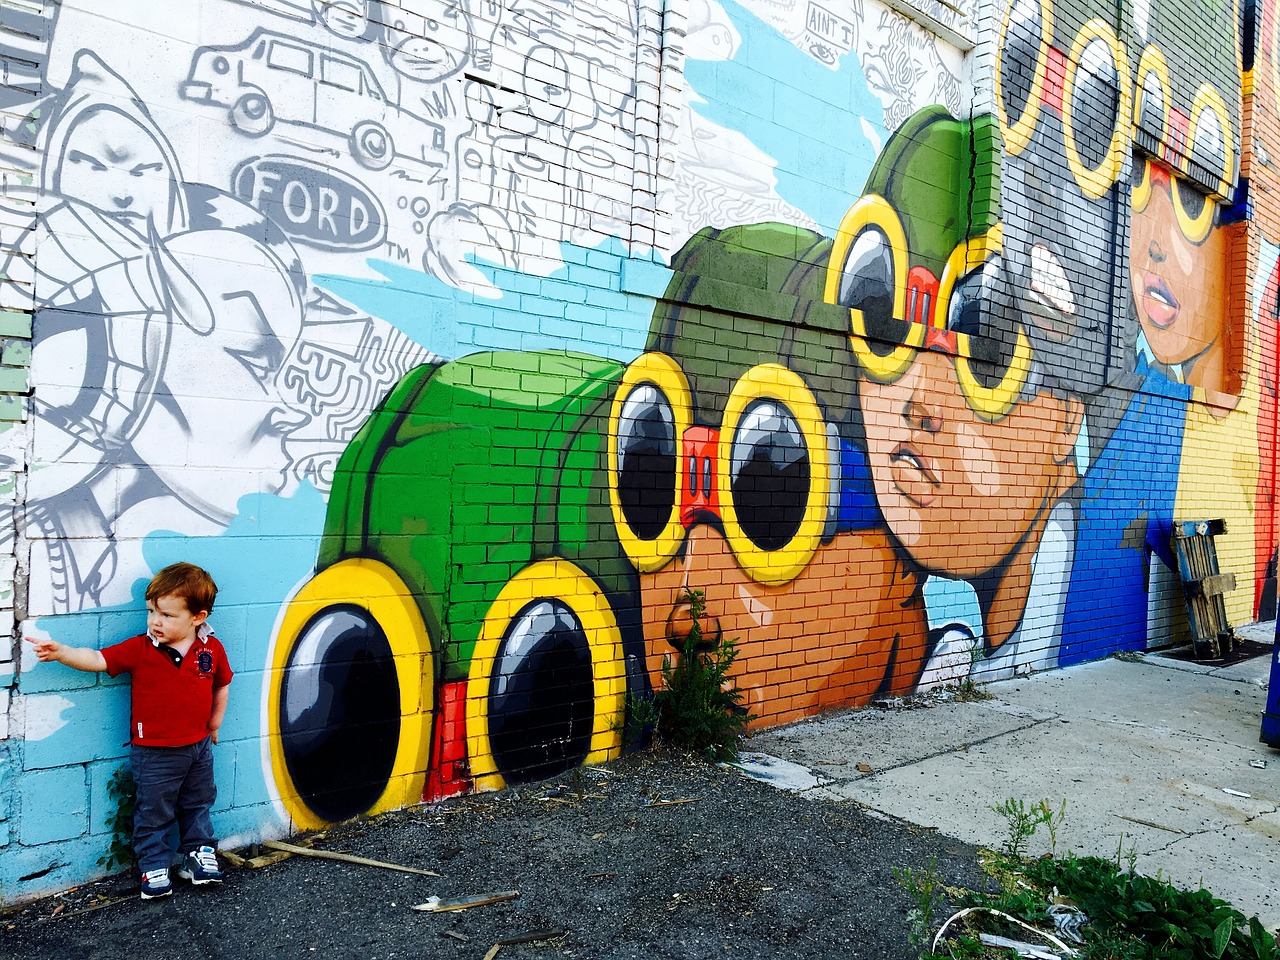 street-art-1655567_1280.jpg